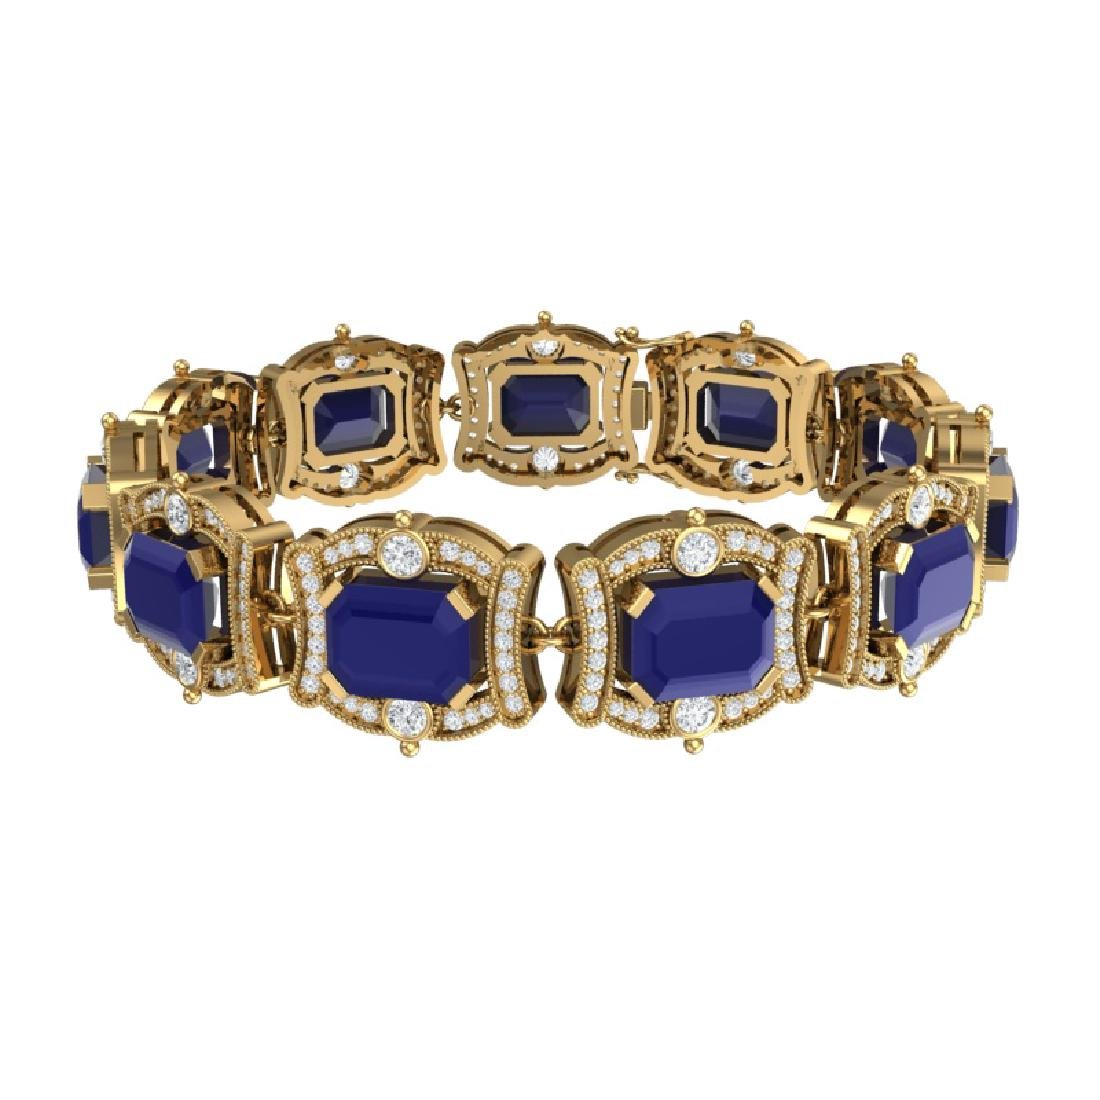 43.87 CTW Royalty Sapphire & VS Diamond Bracelet 18K - 3